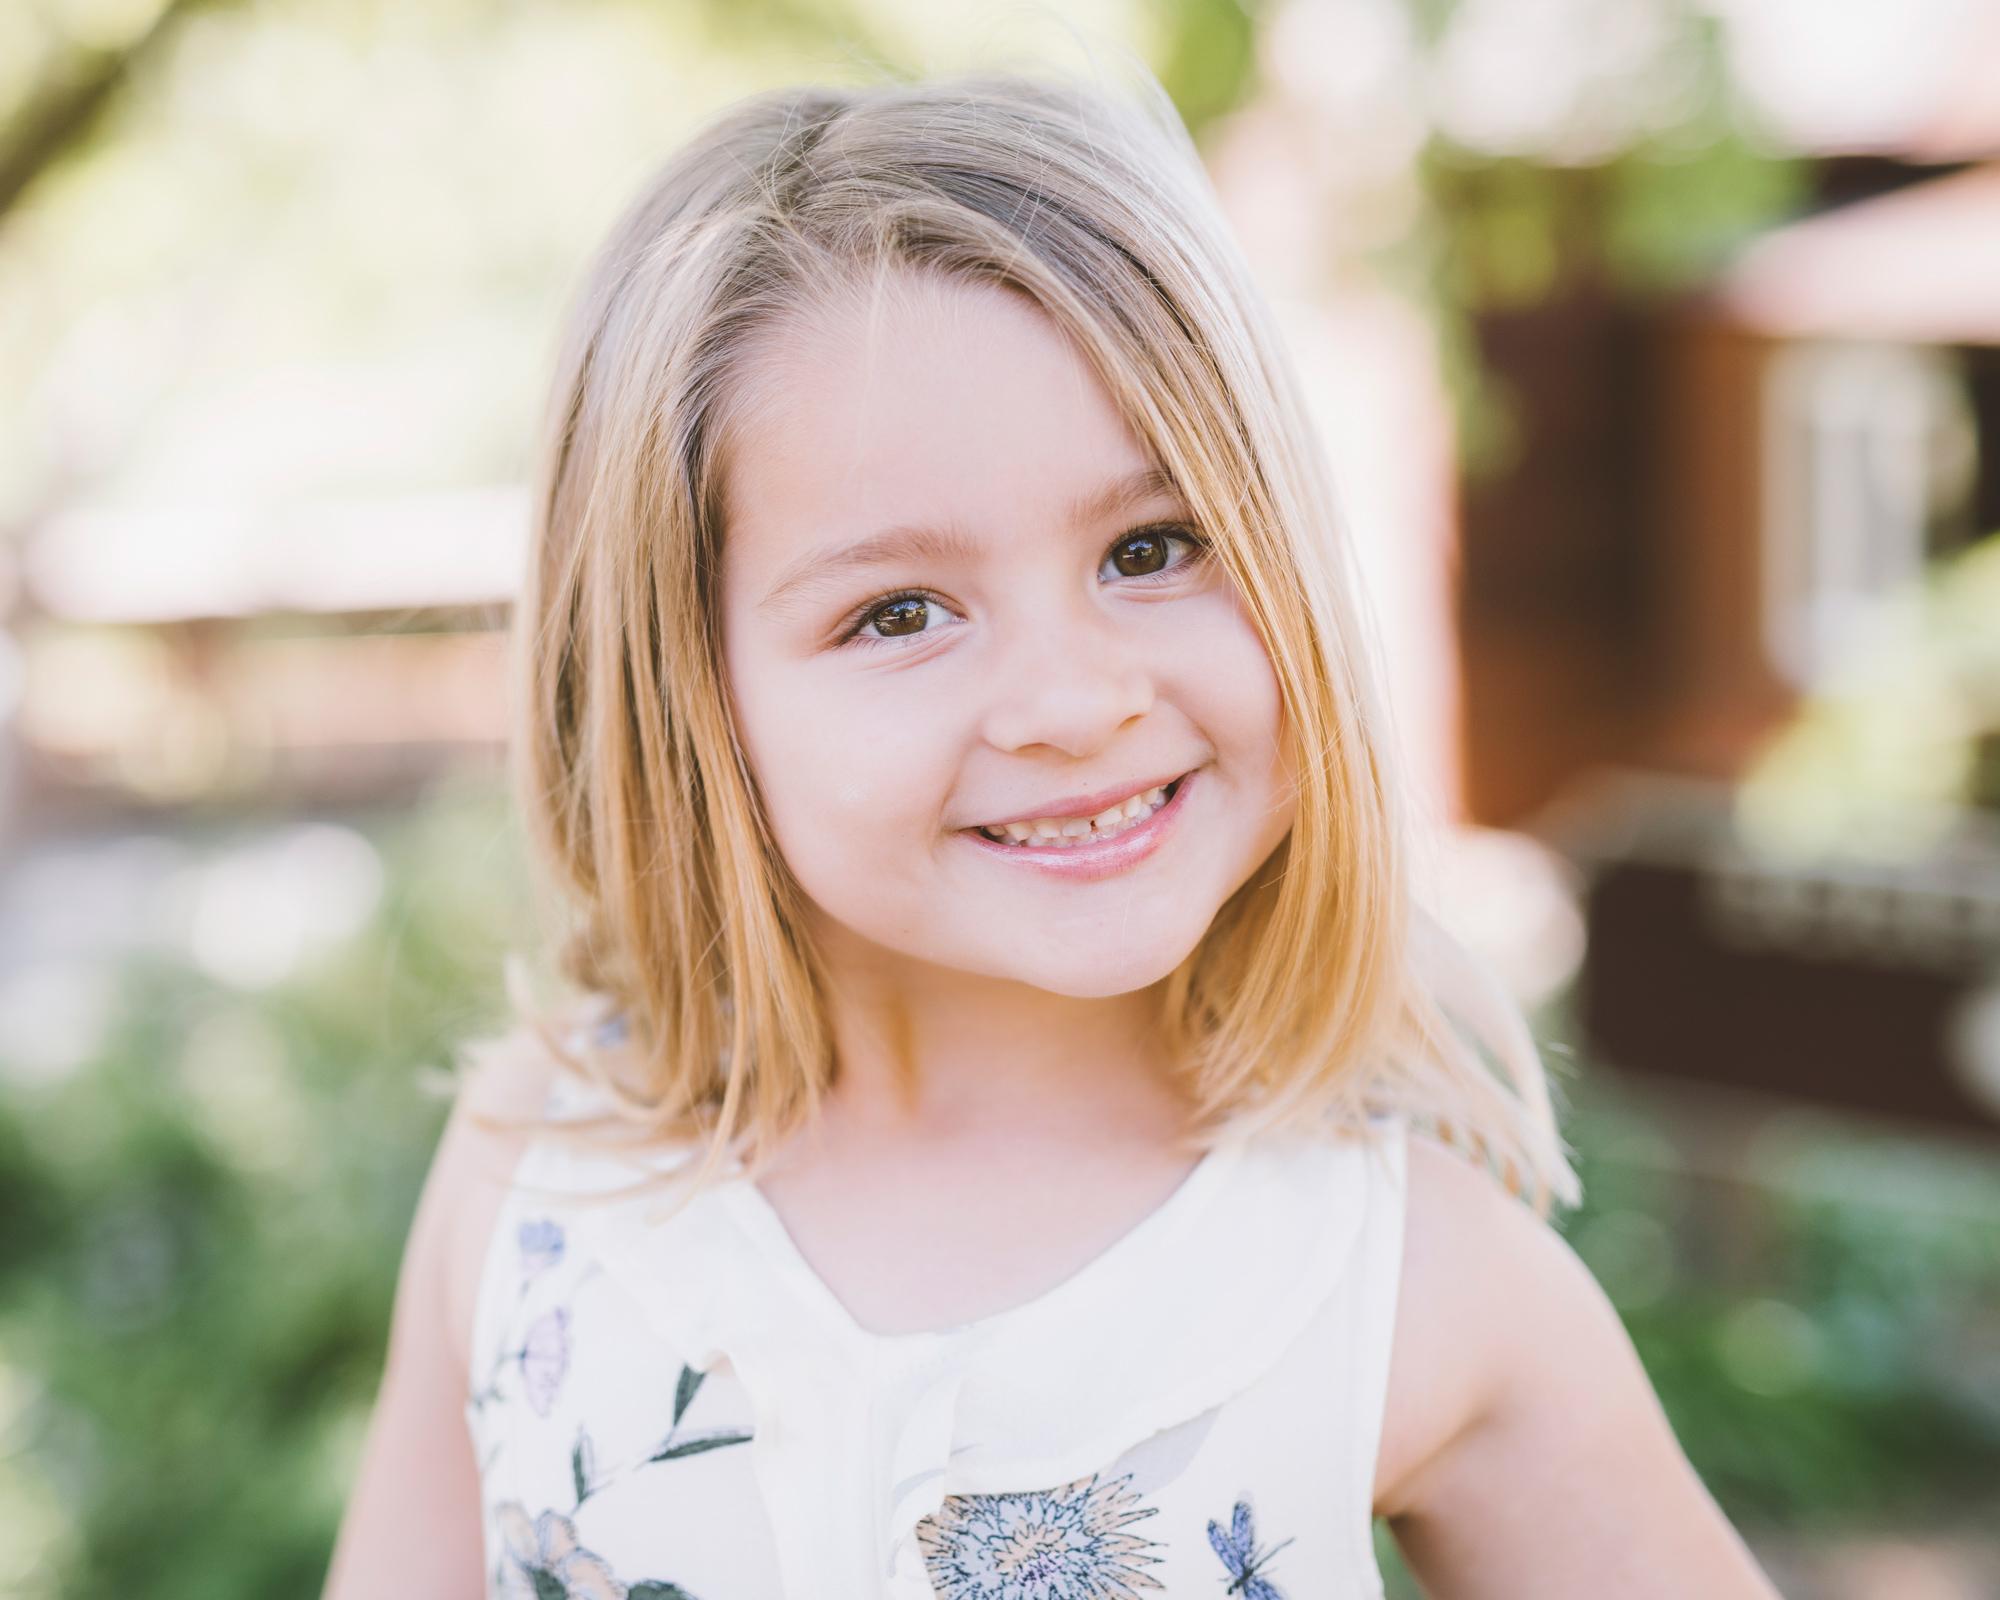 beautiful-five-year-old-girl-portrait.jpg